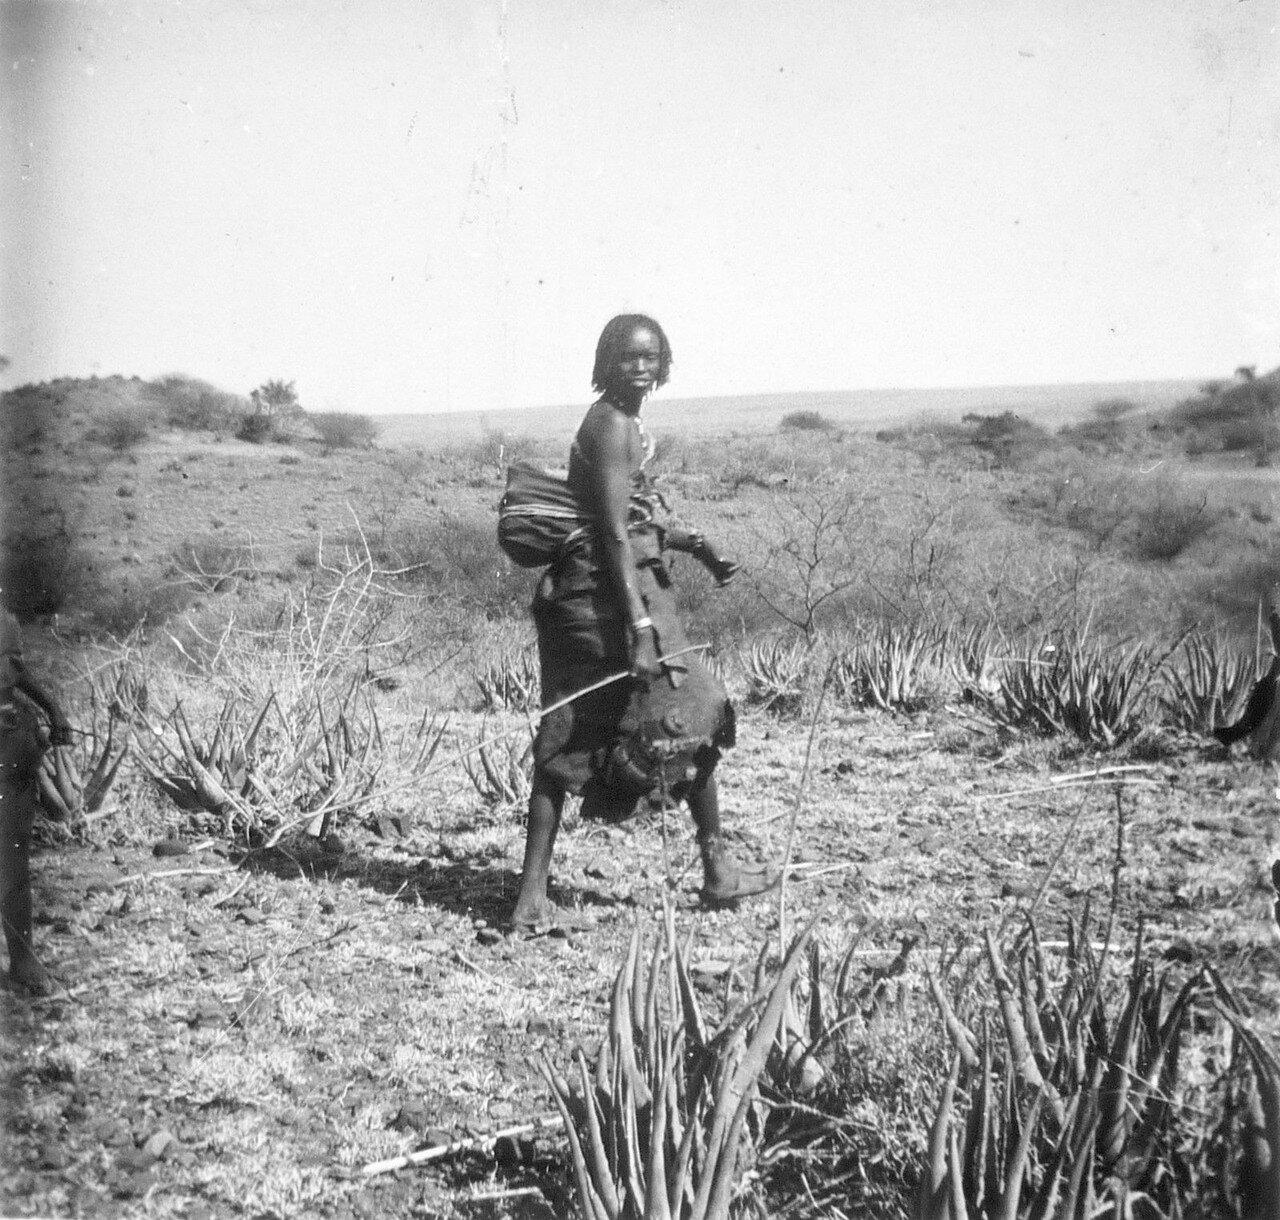 1897. Абиссиния. Женщина данкали на дороге Джибутти - Аддис-Абеба